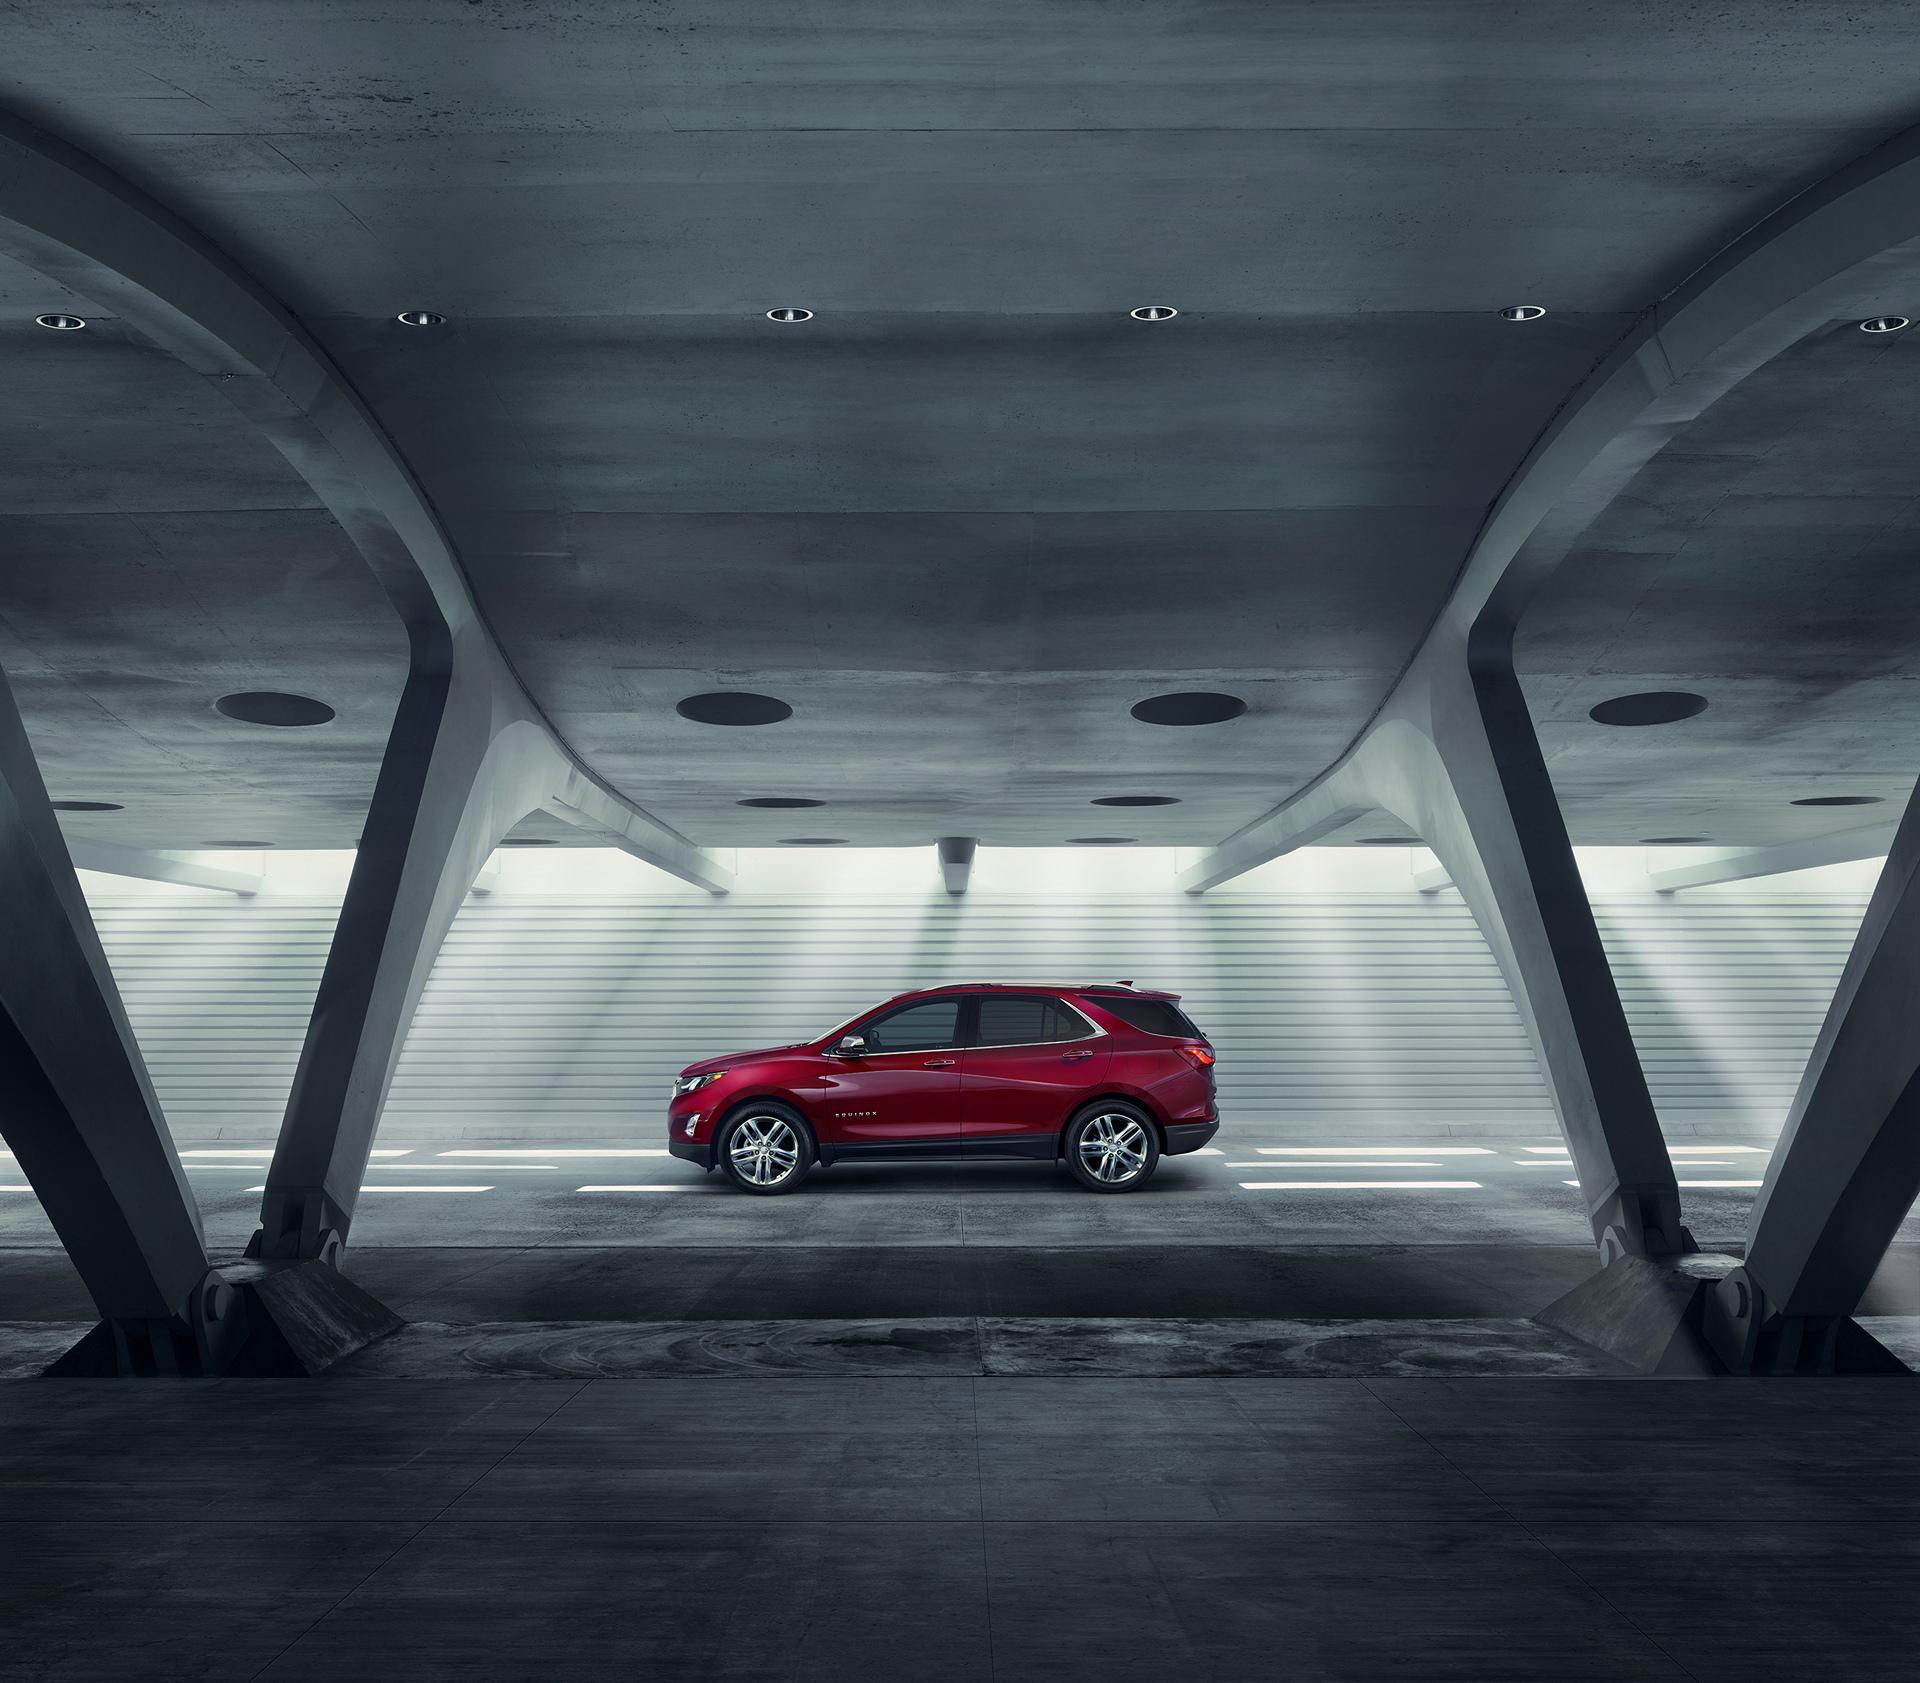 2018 Chevrolet Equinox © General Motors